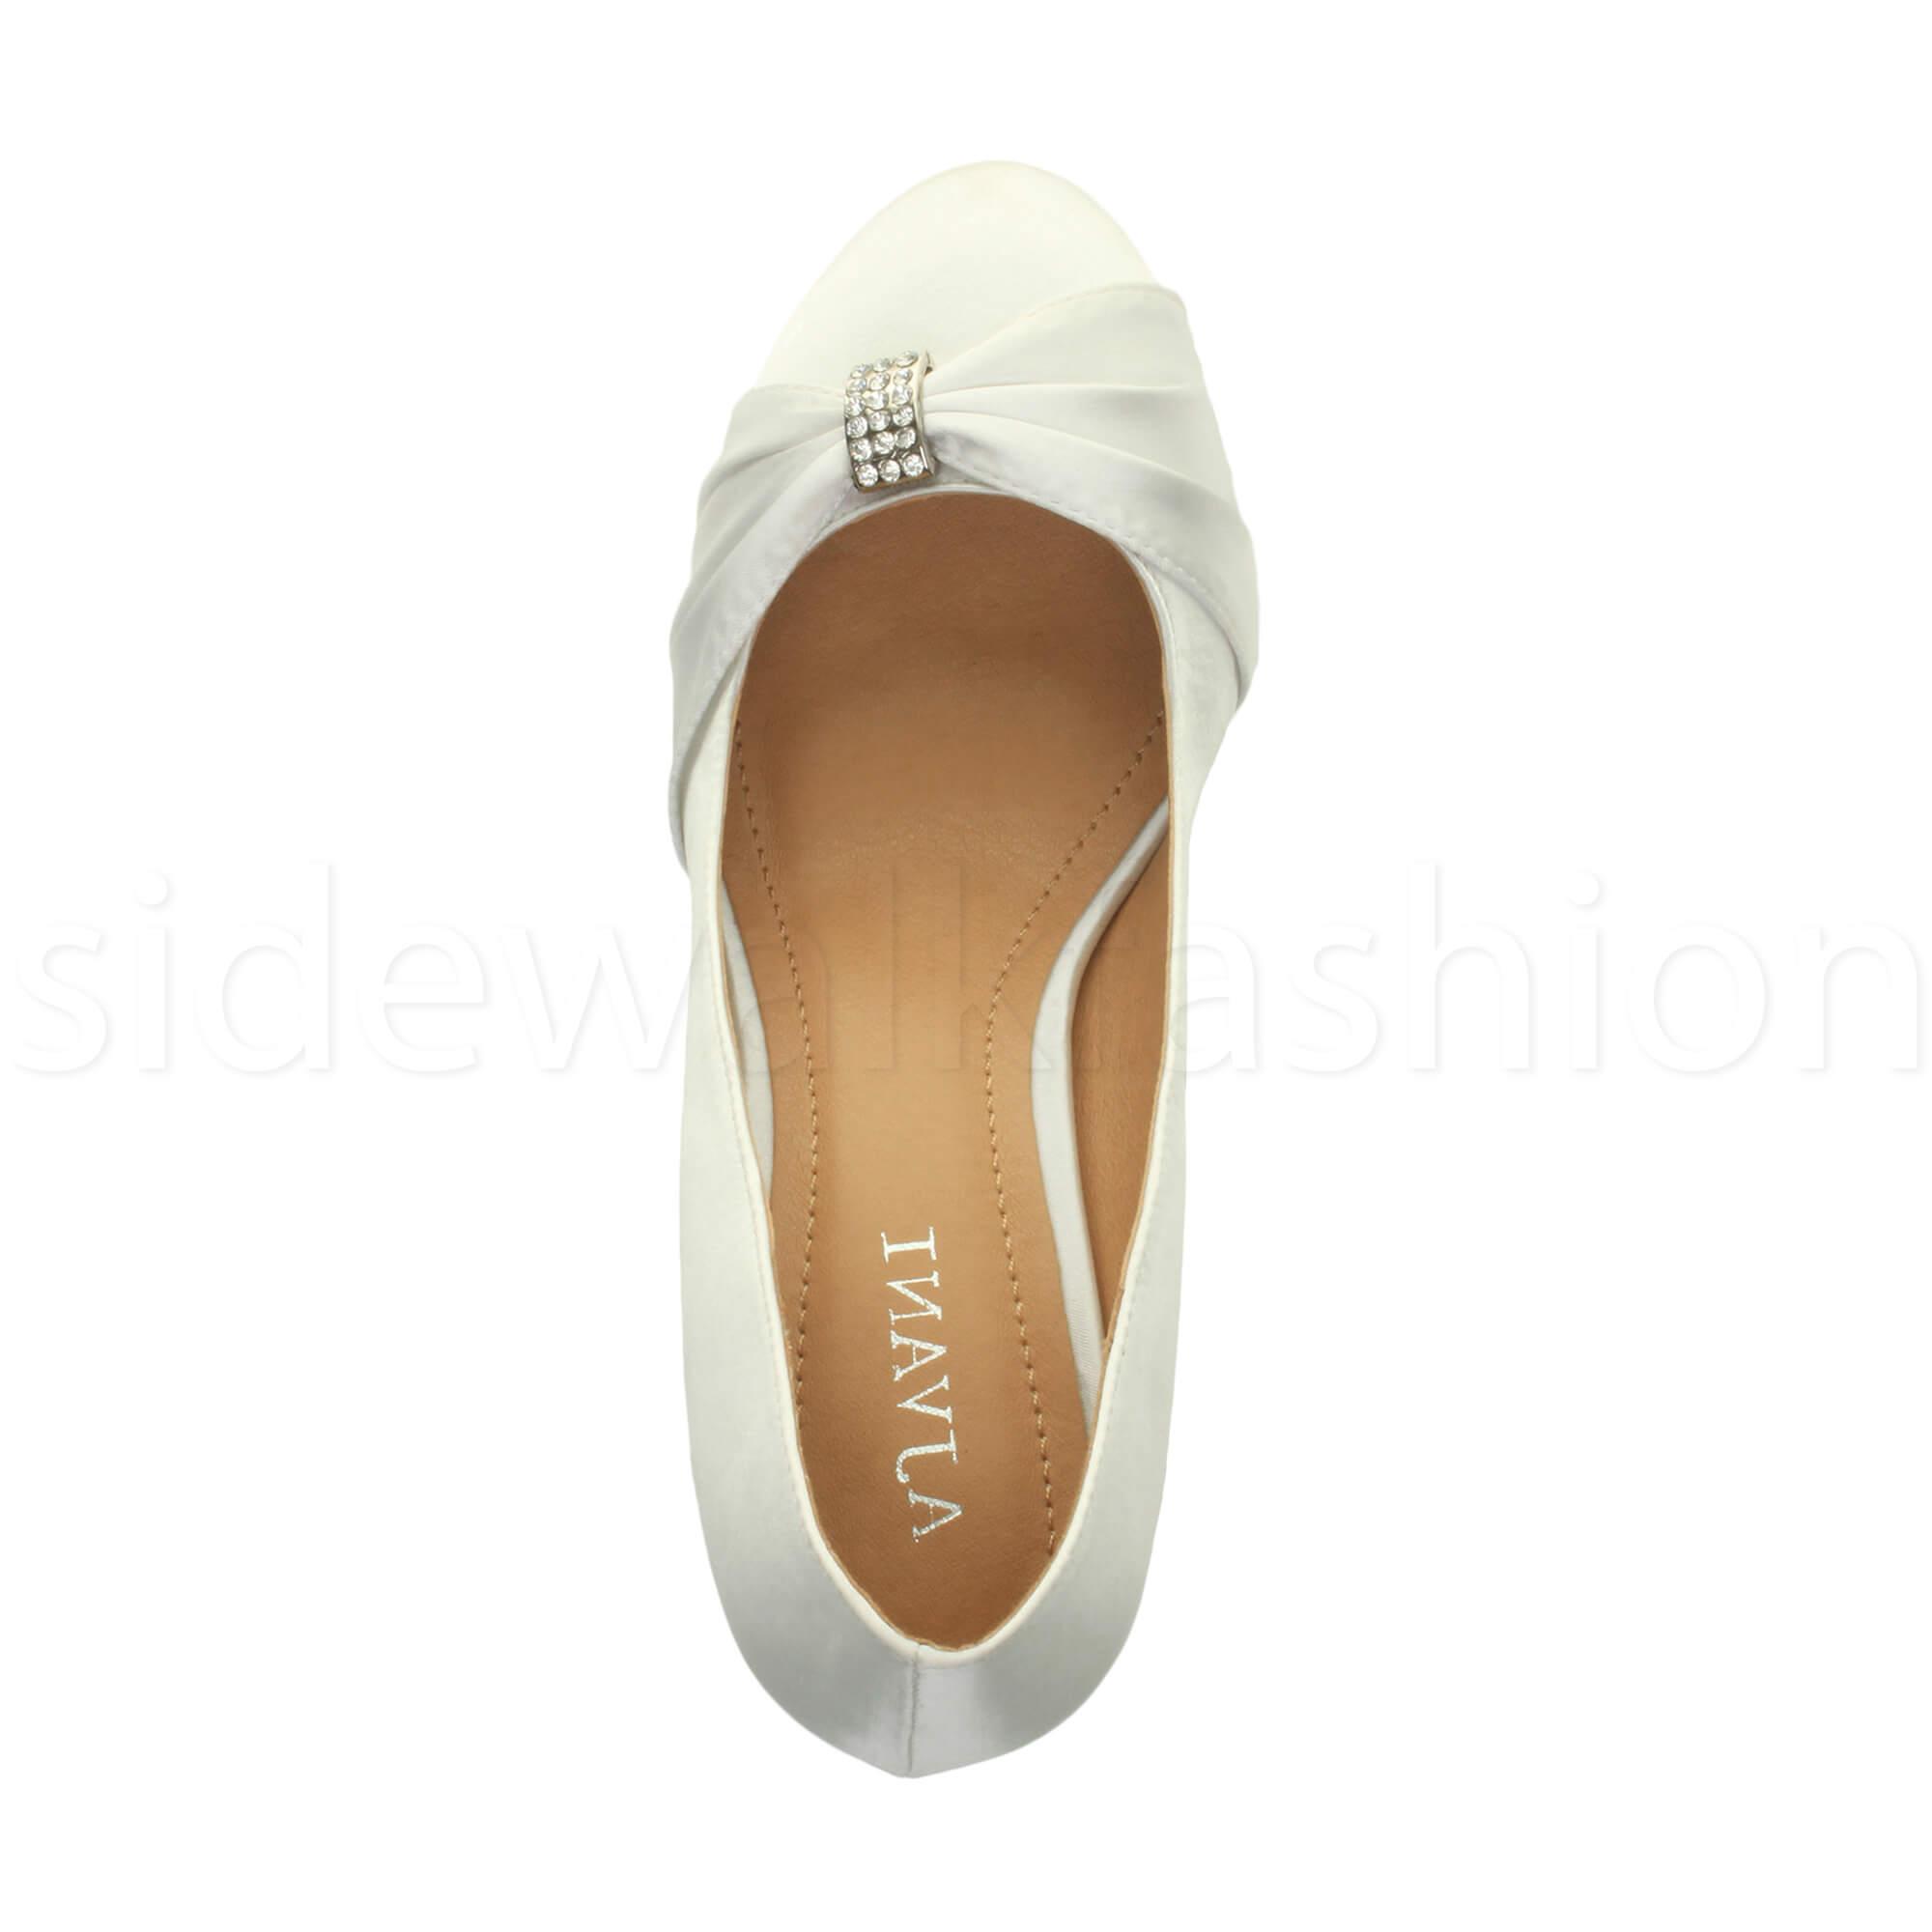 Womens-ladies-low-mid-heel-diamante-party-smart-evening-court-shoes-size thumbnail 112